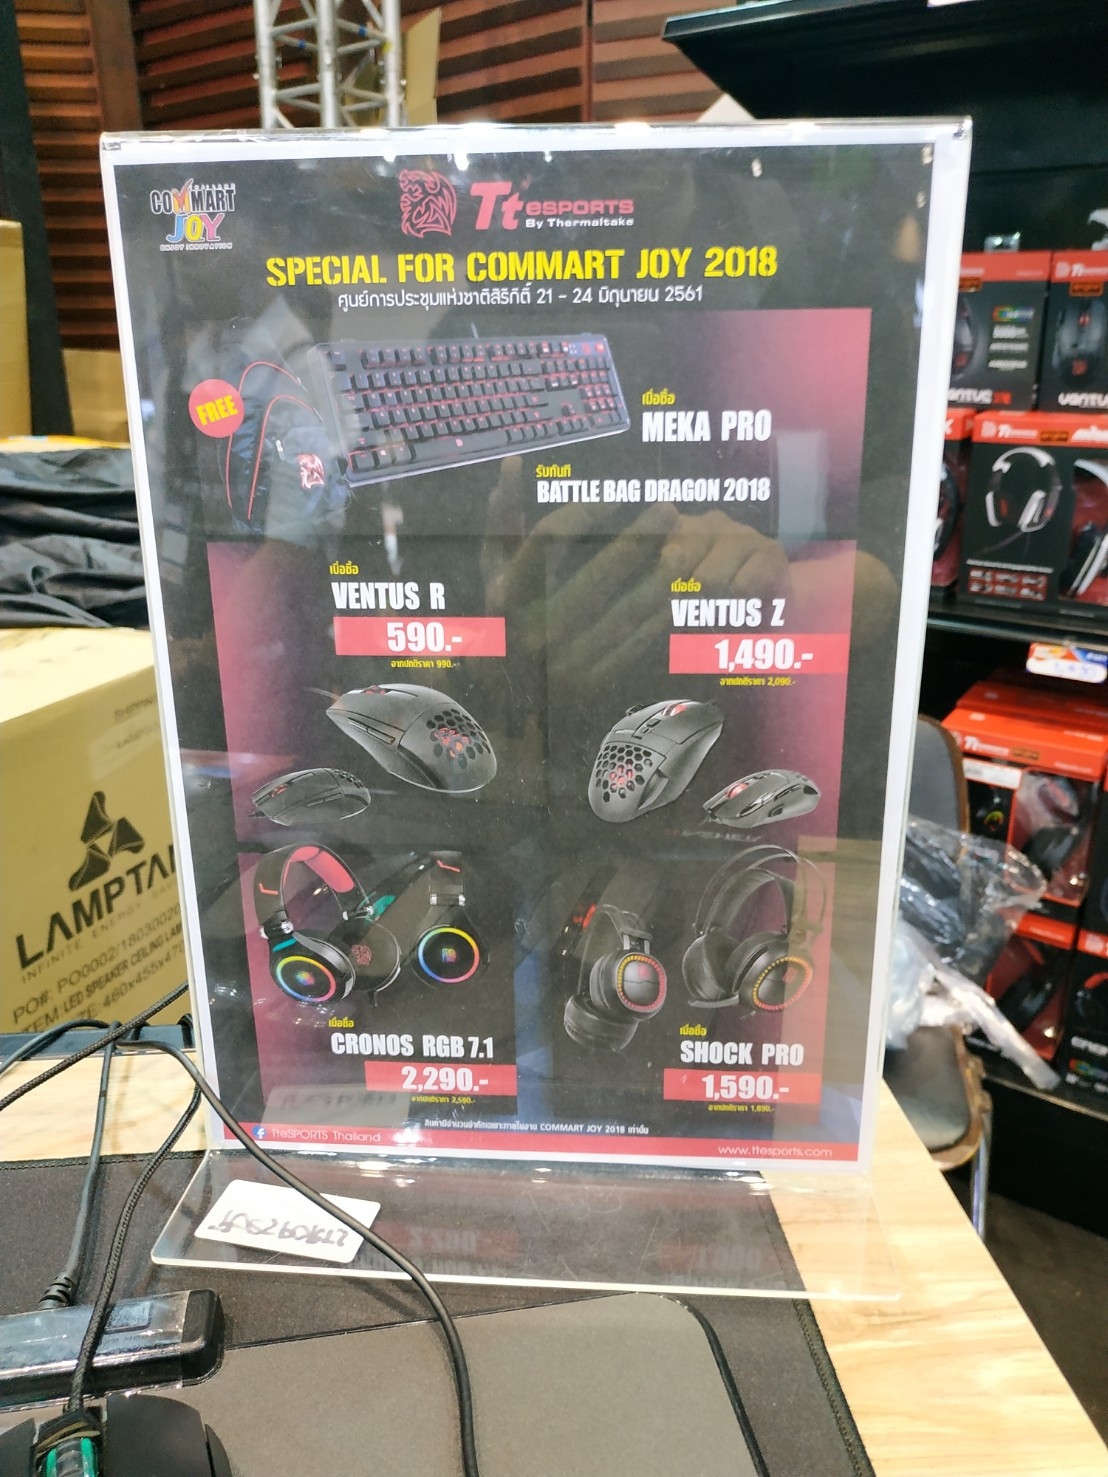 gaming gear commart joy 2018 22